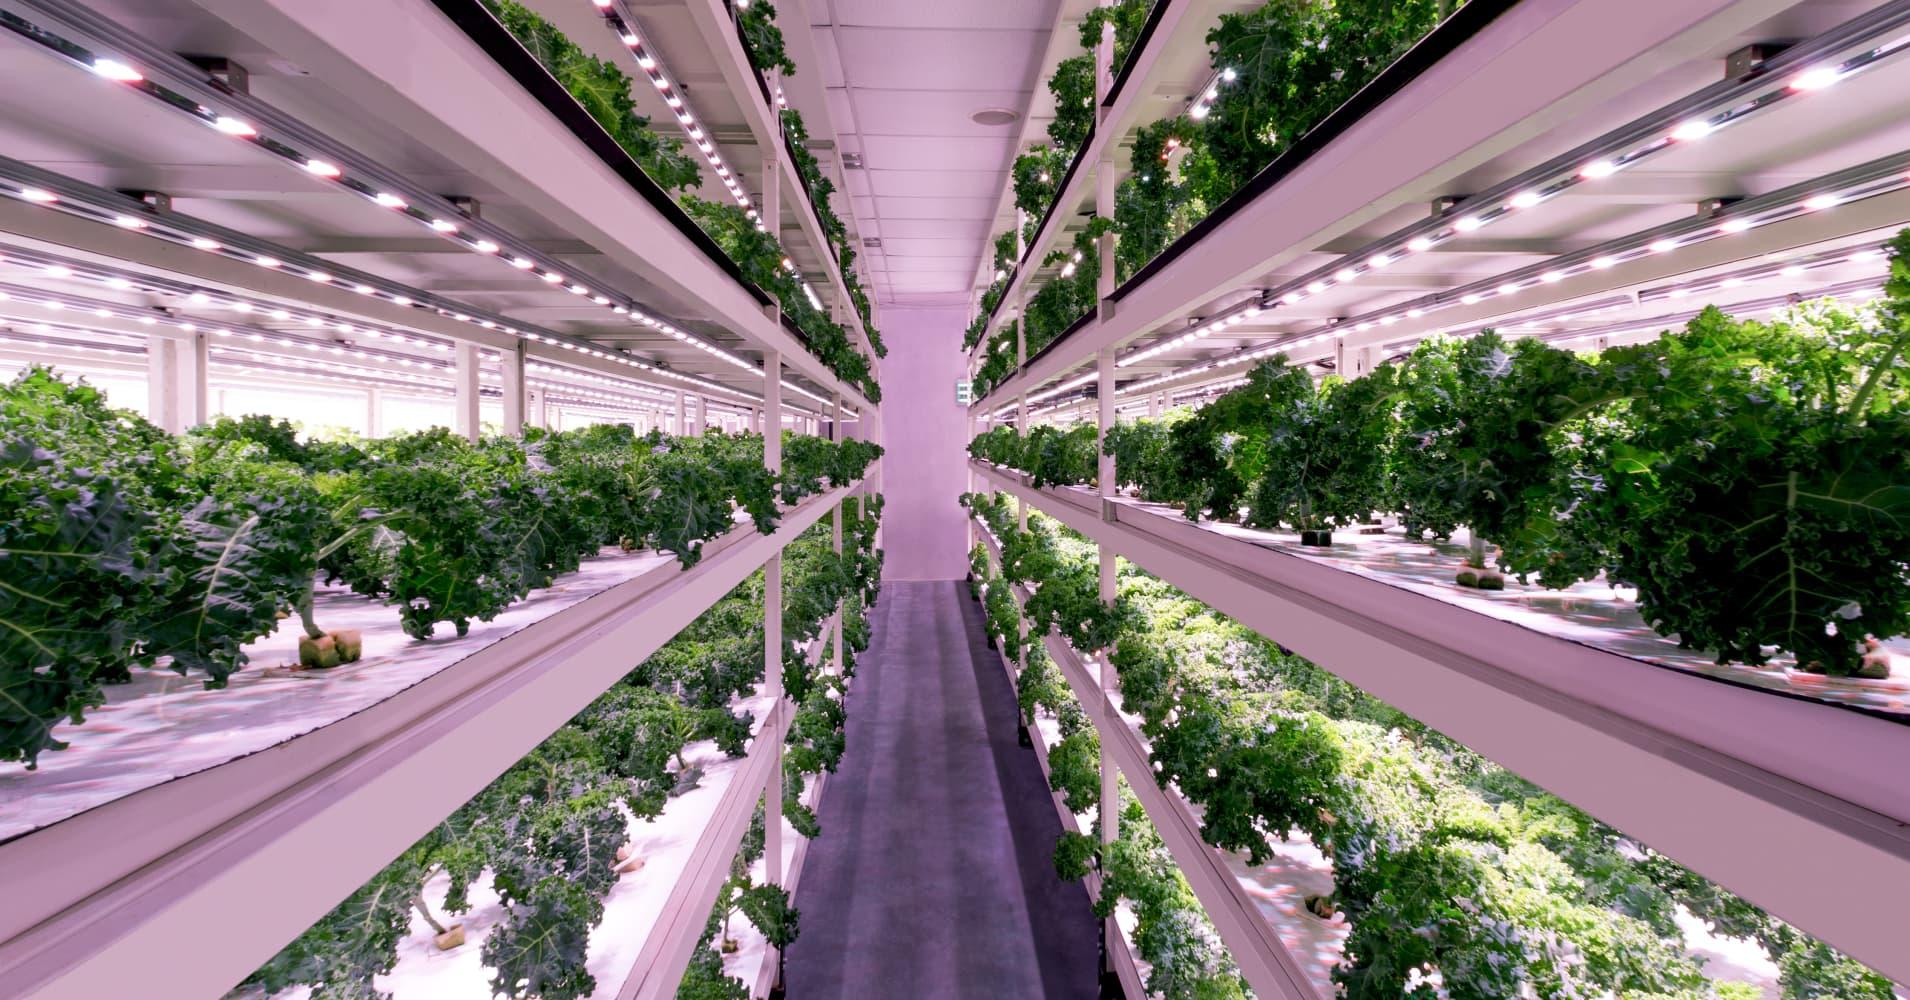 Kale growing in Sustenir's Singapore-based vertical farm facility.